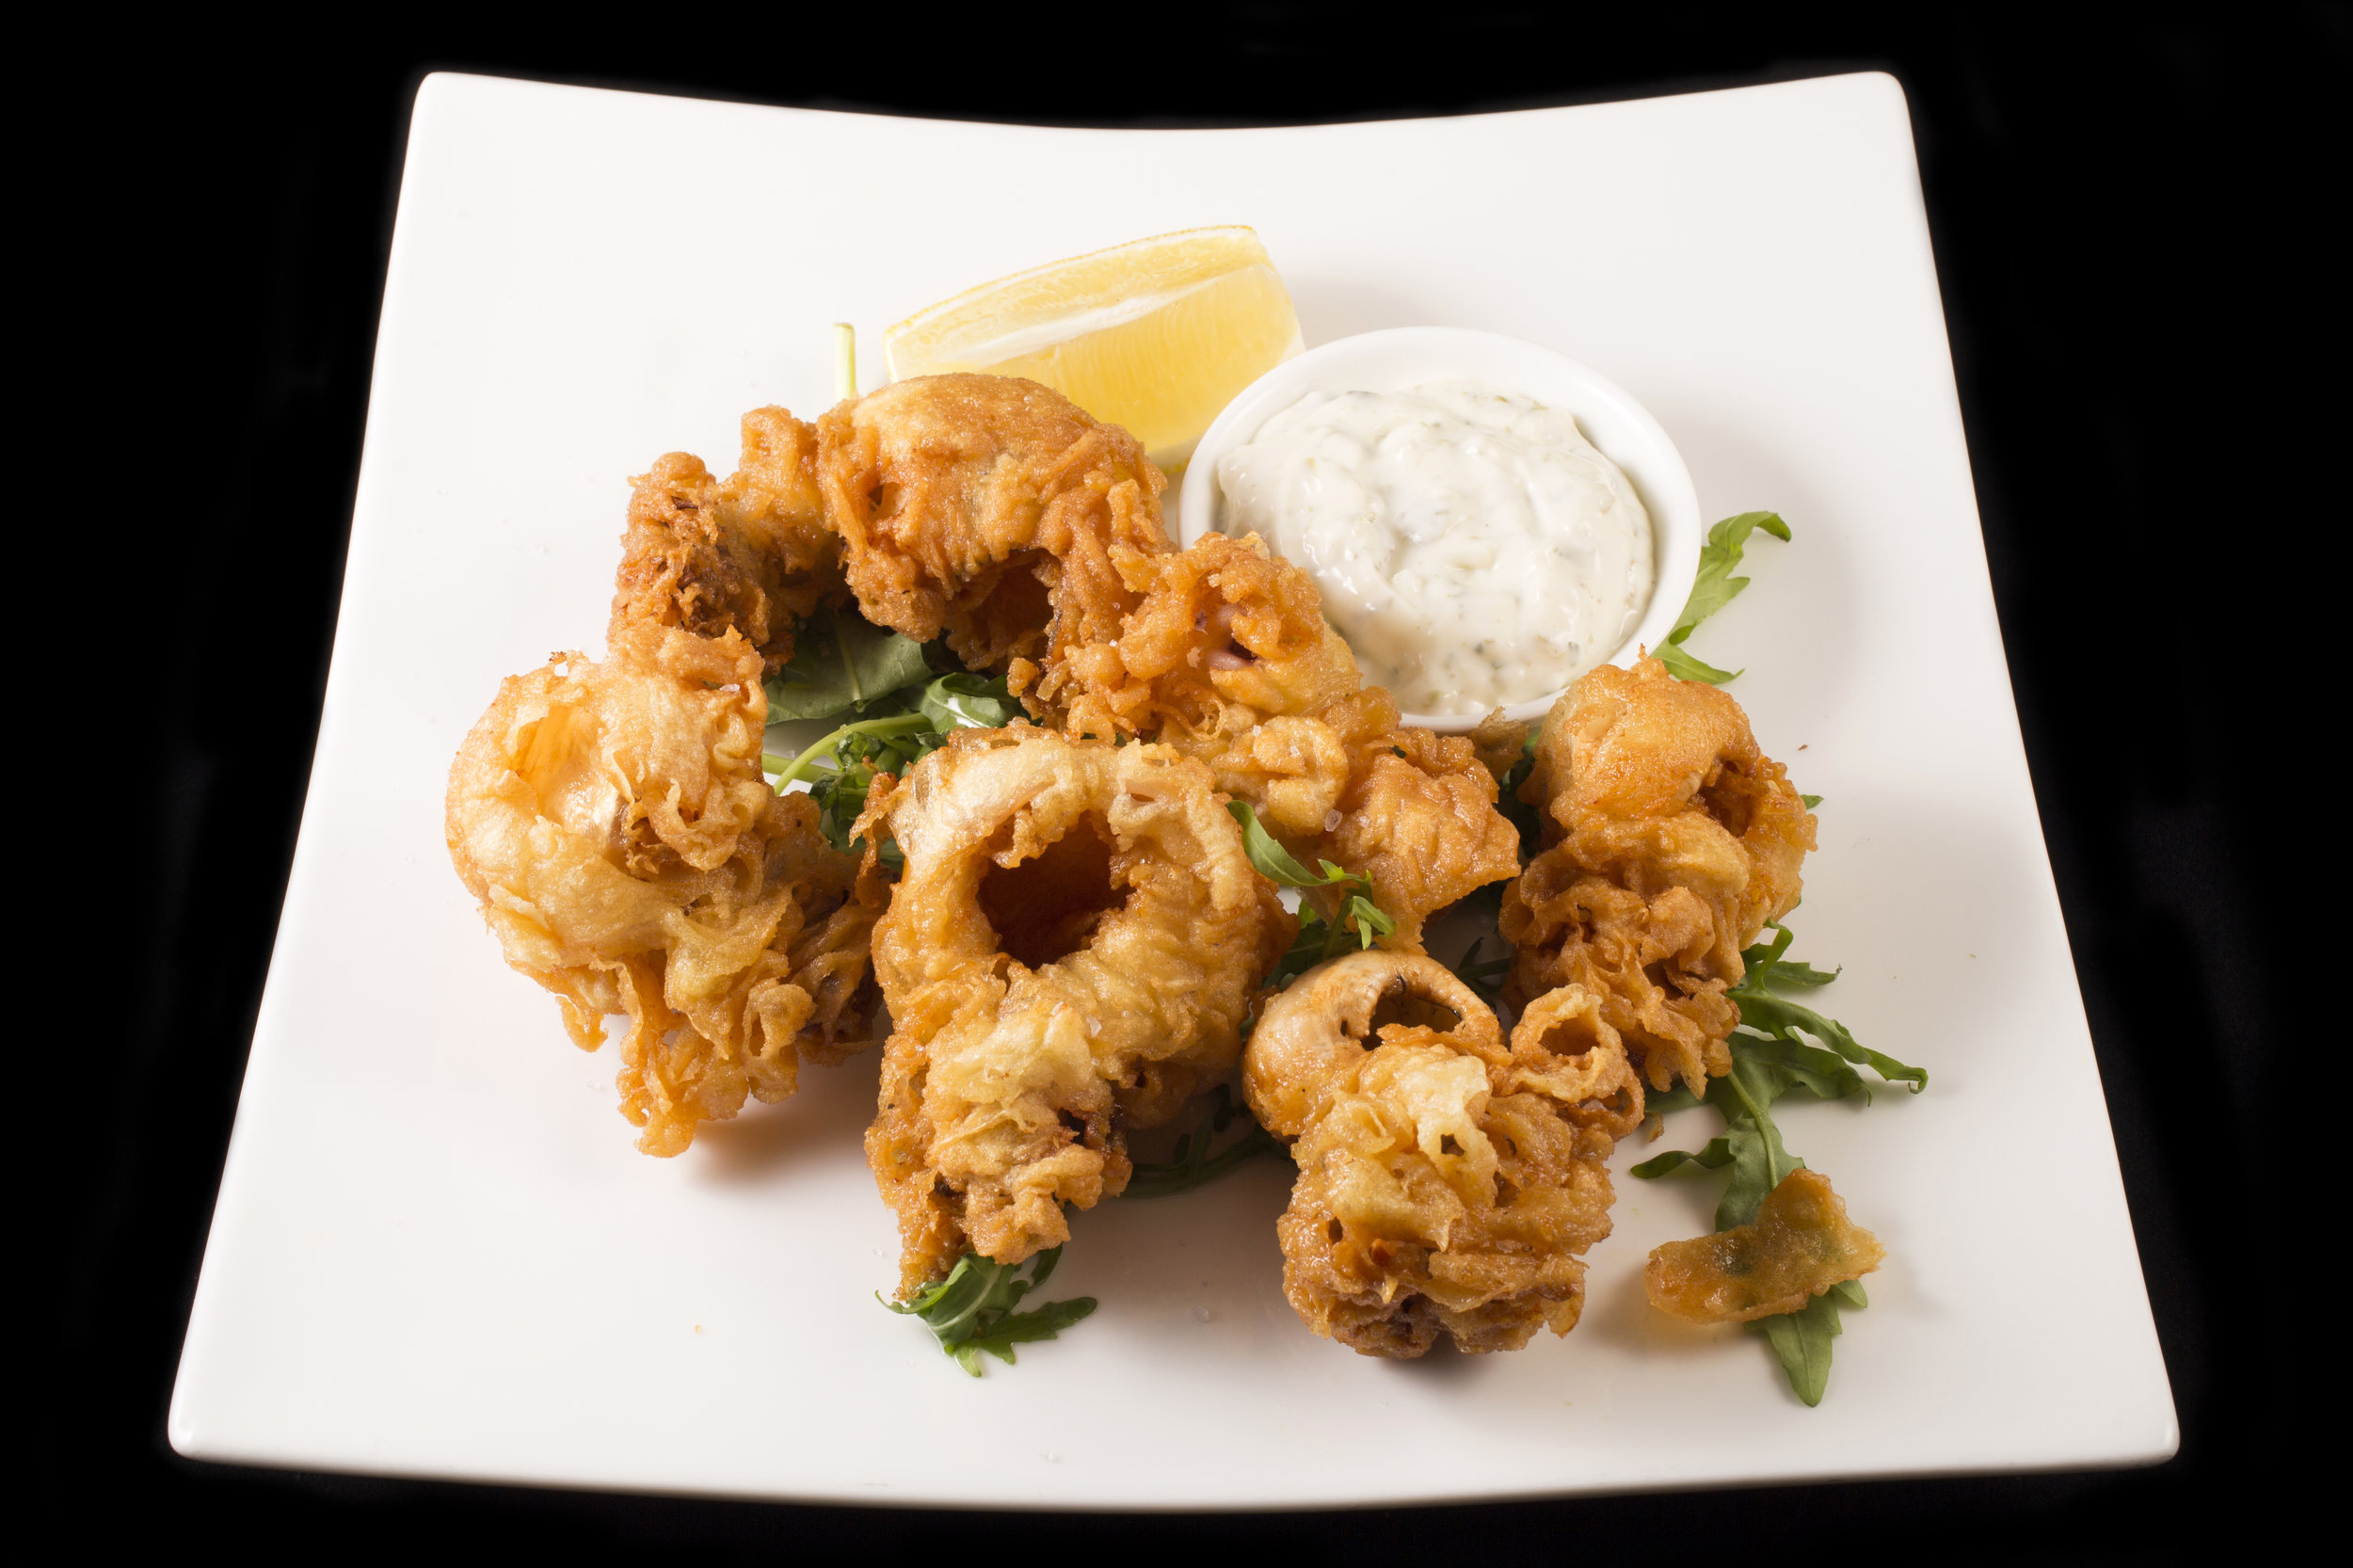 Fried Cuttlefish with Tartar Sauce. 炸魷魚配他他汁.